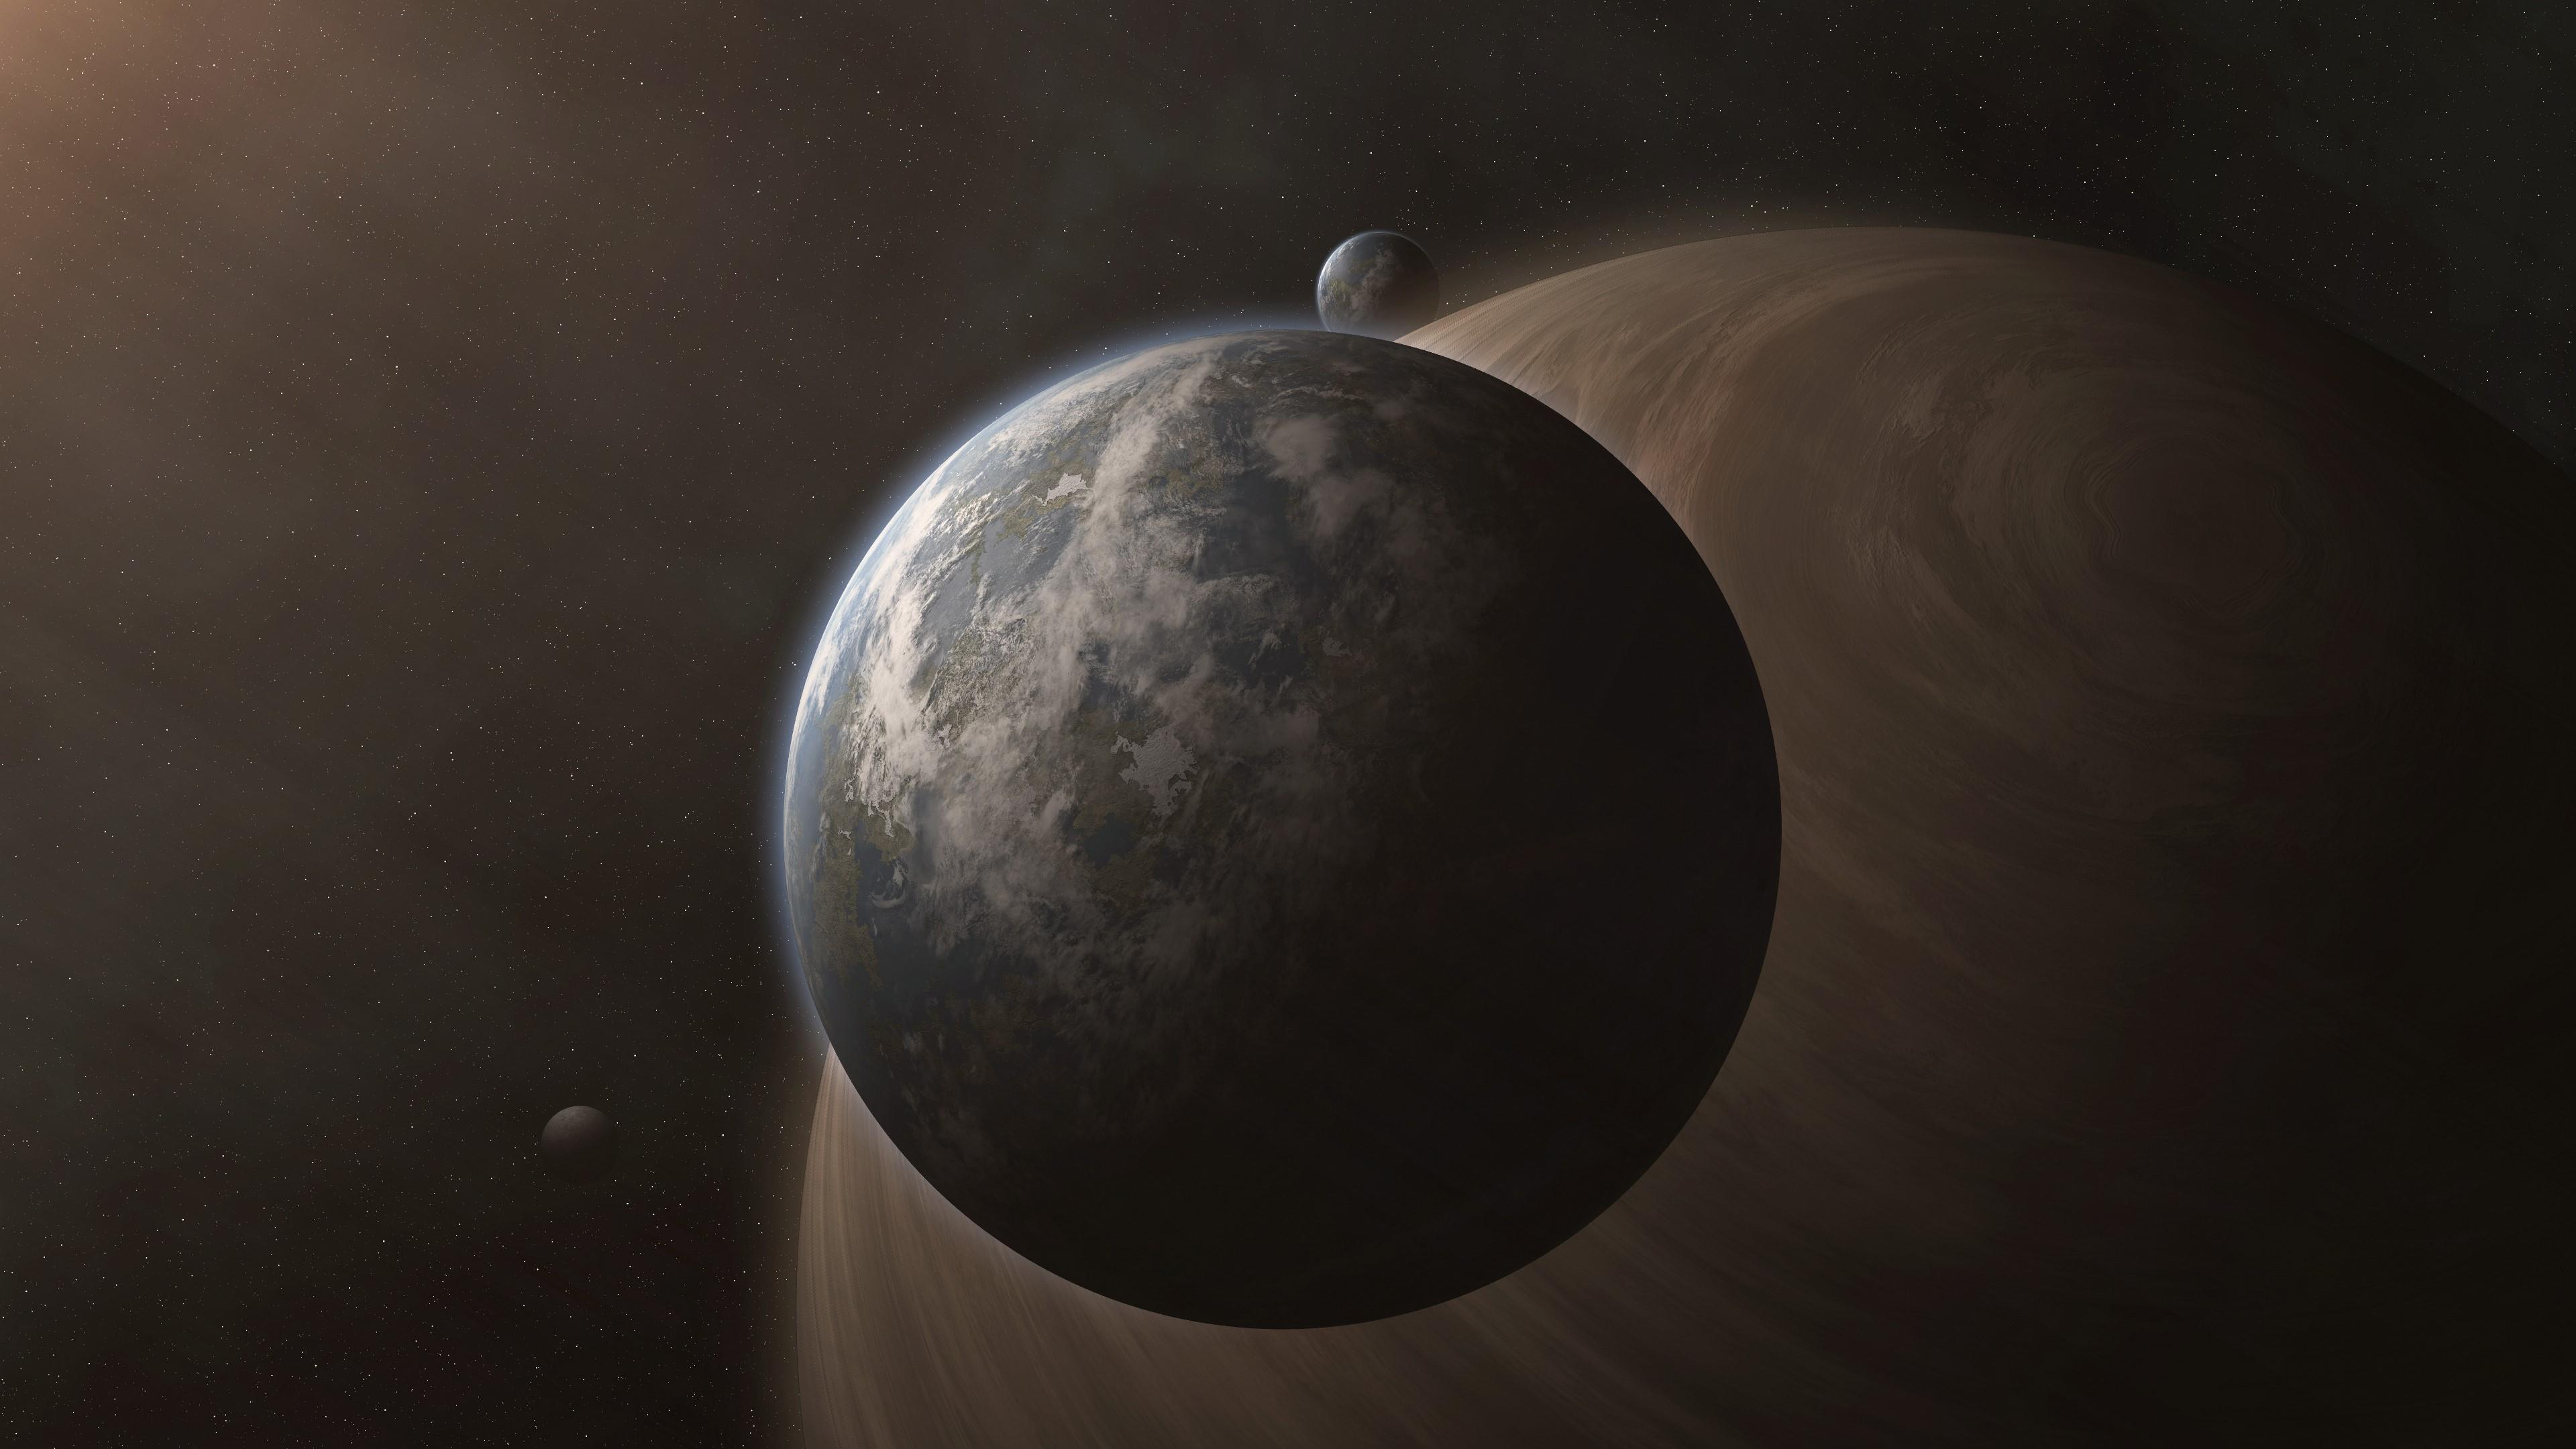 Earth-like planet space art wallpaper